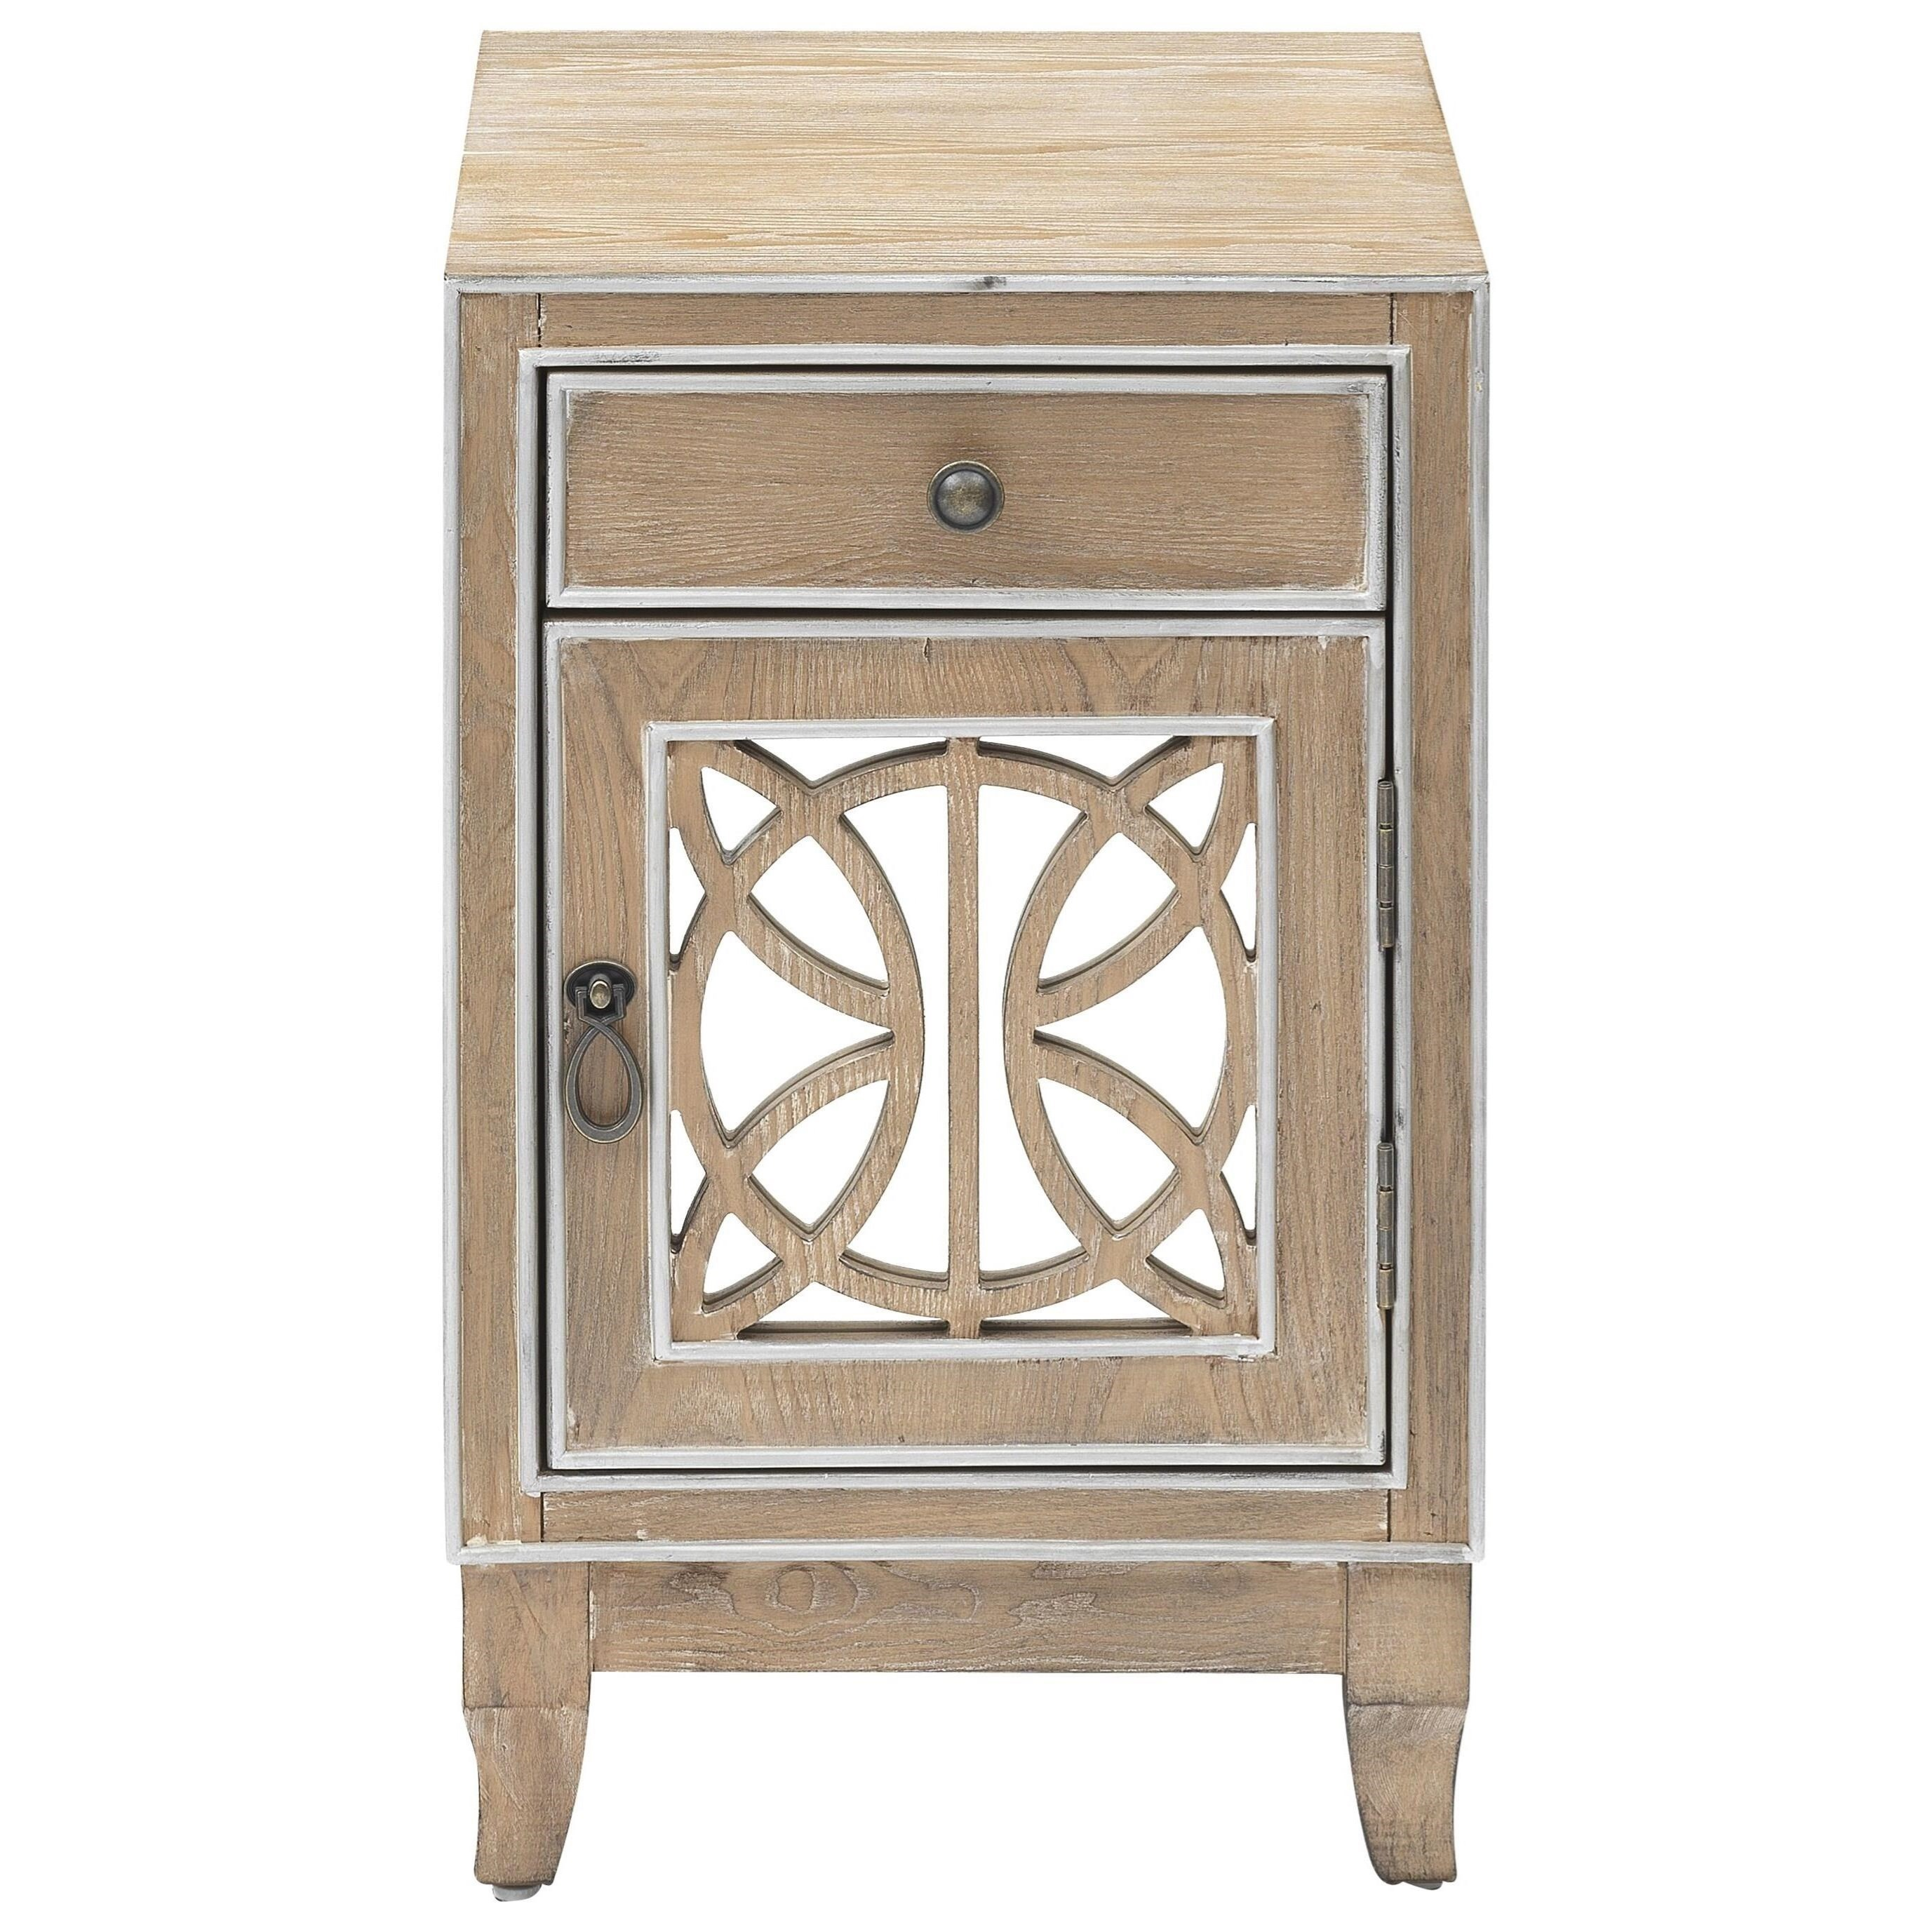 40220 1-Door 1-Drawer Chairside Cabinet by Kaleidoscope at Sprintz Furniture